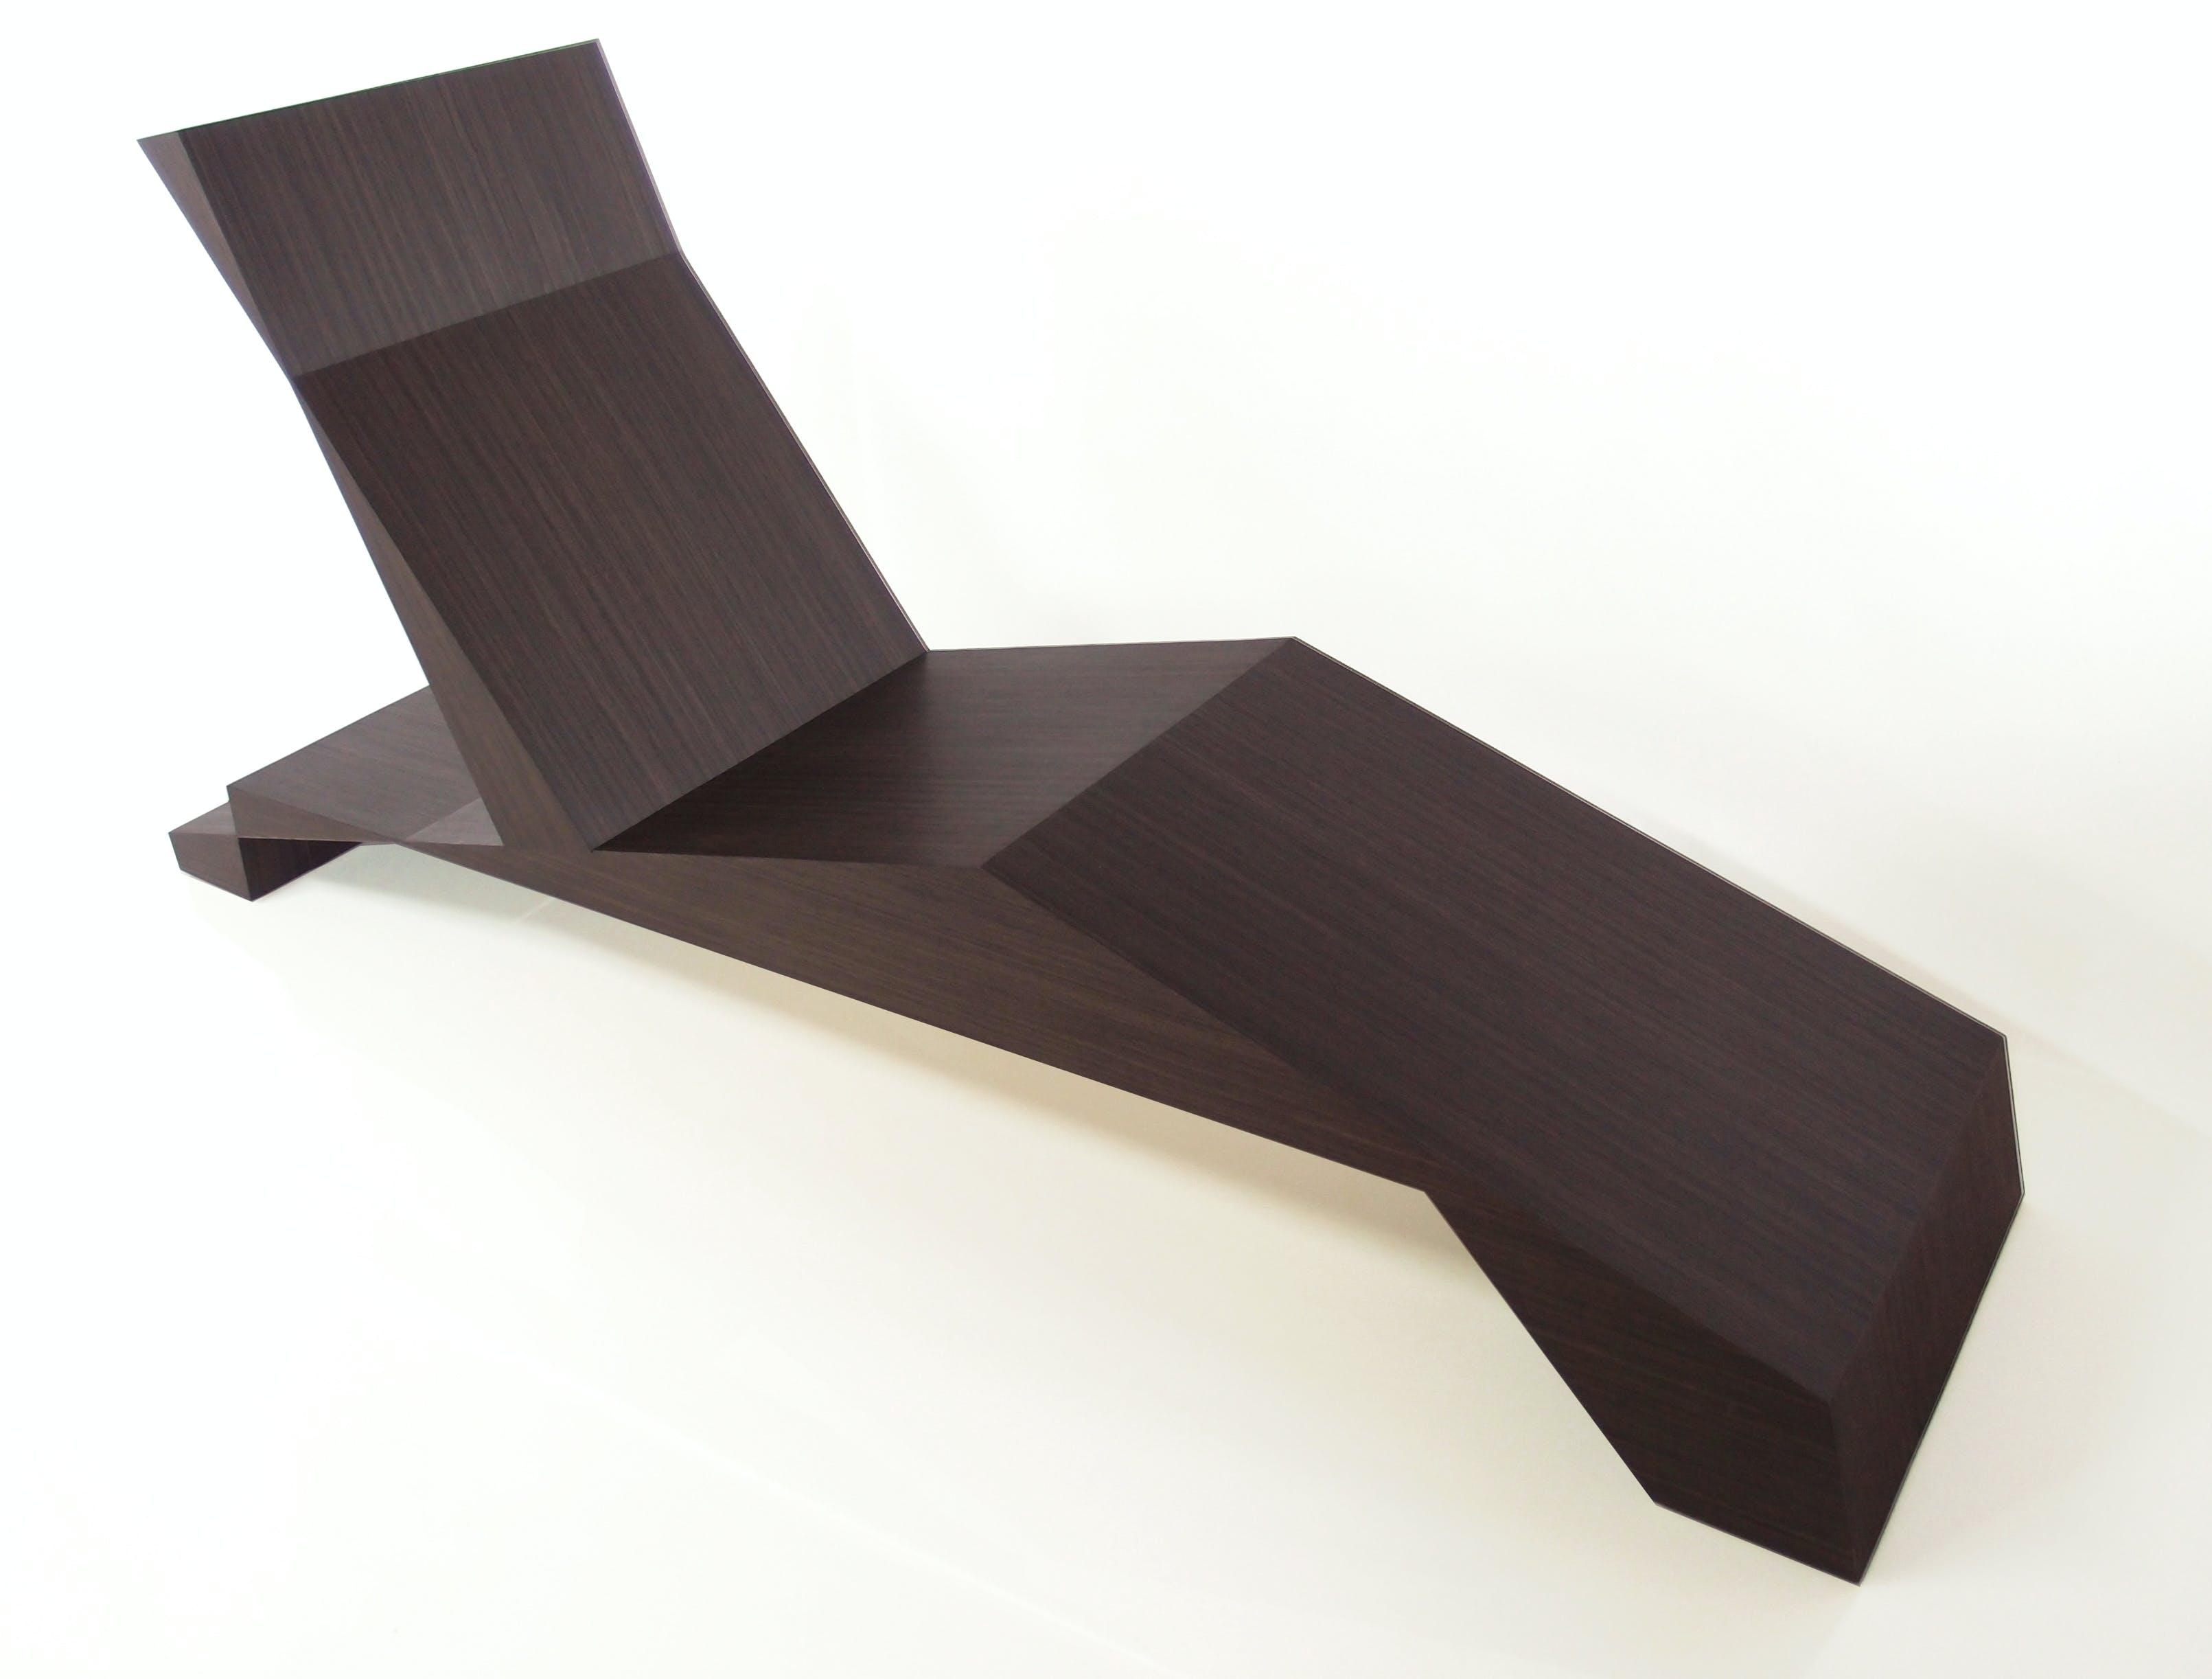 Stickfigure Chaise